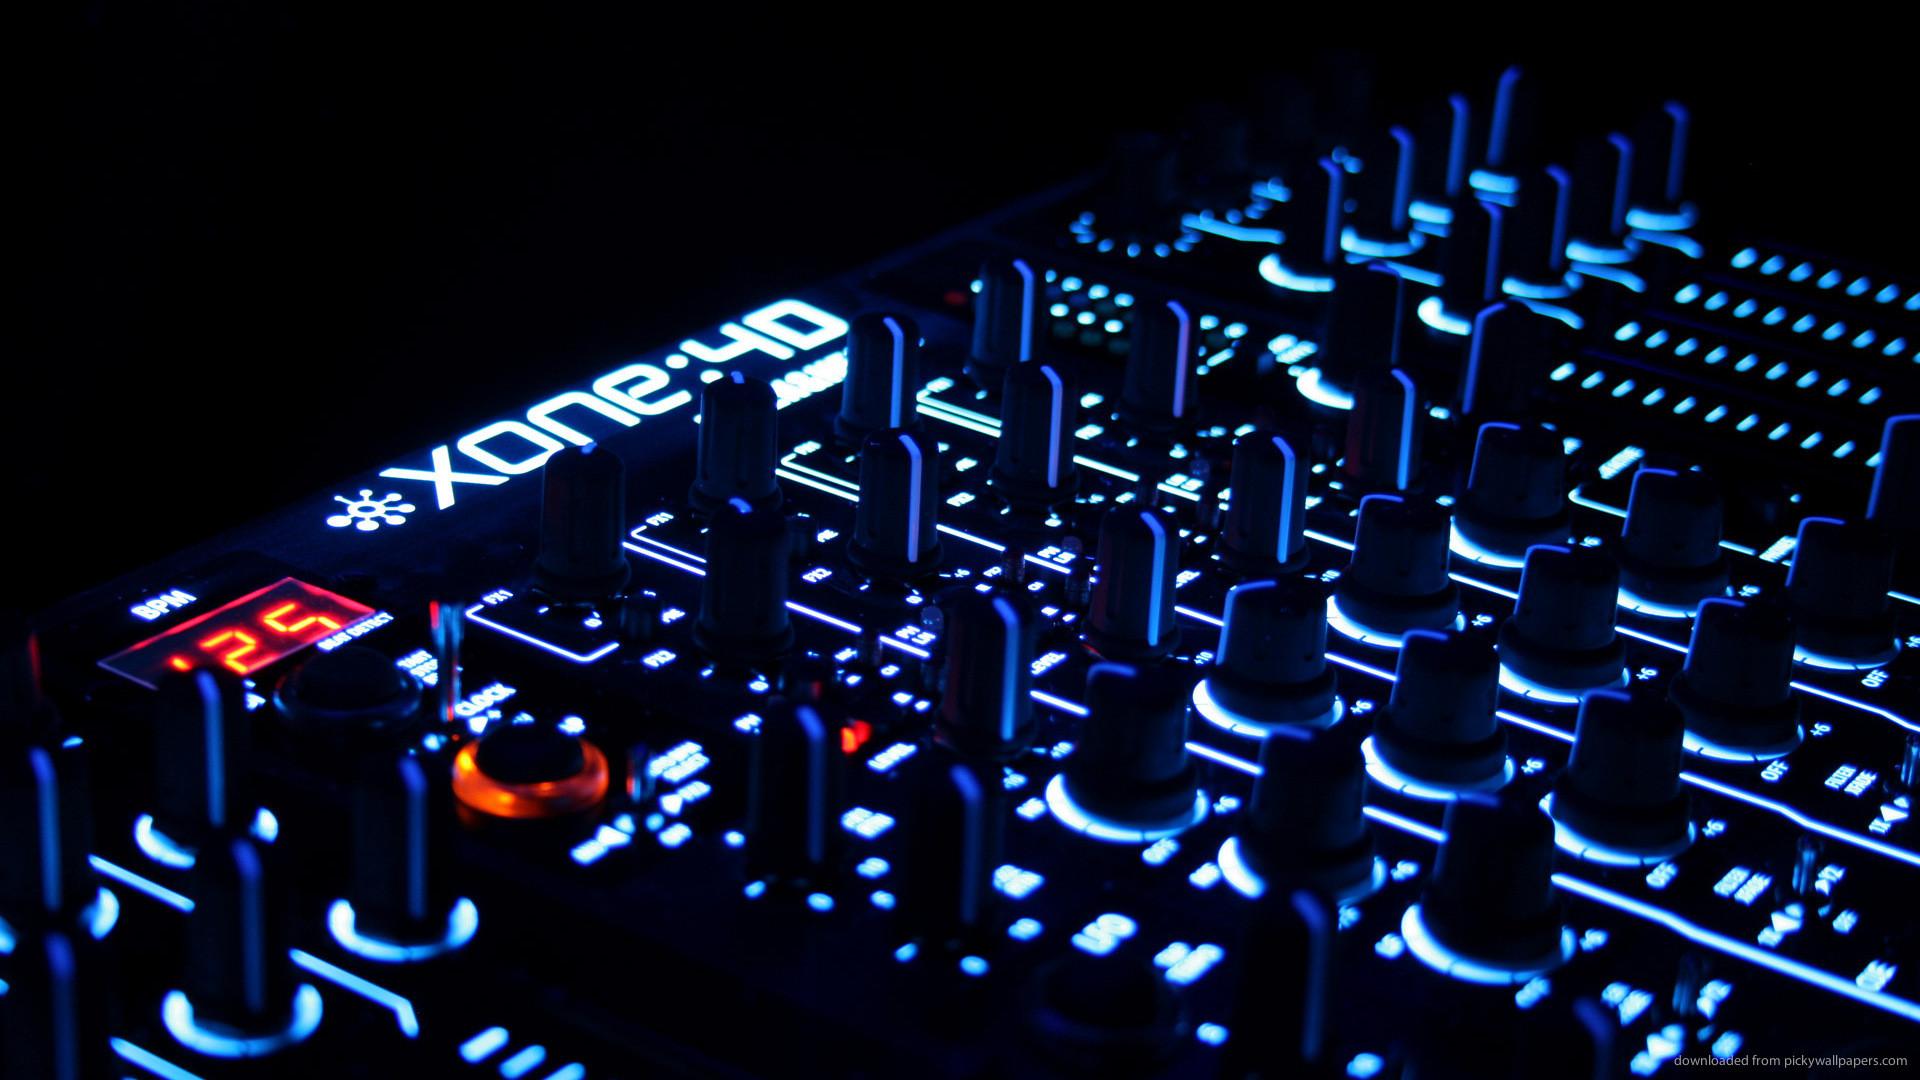 DJ Set for 1920×1080